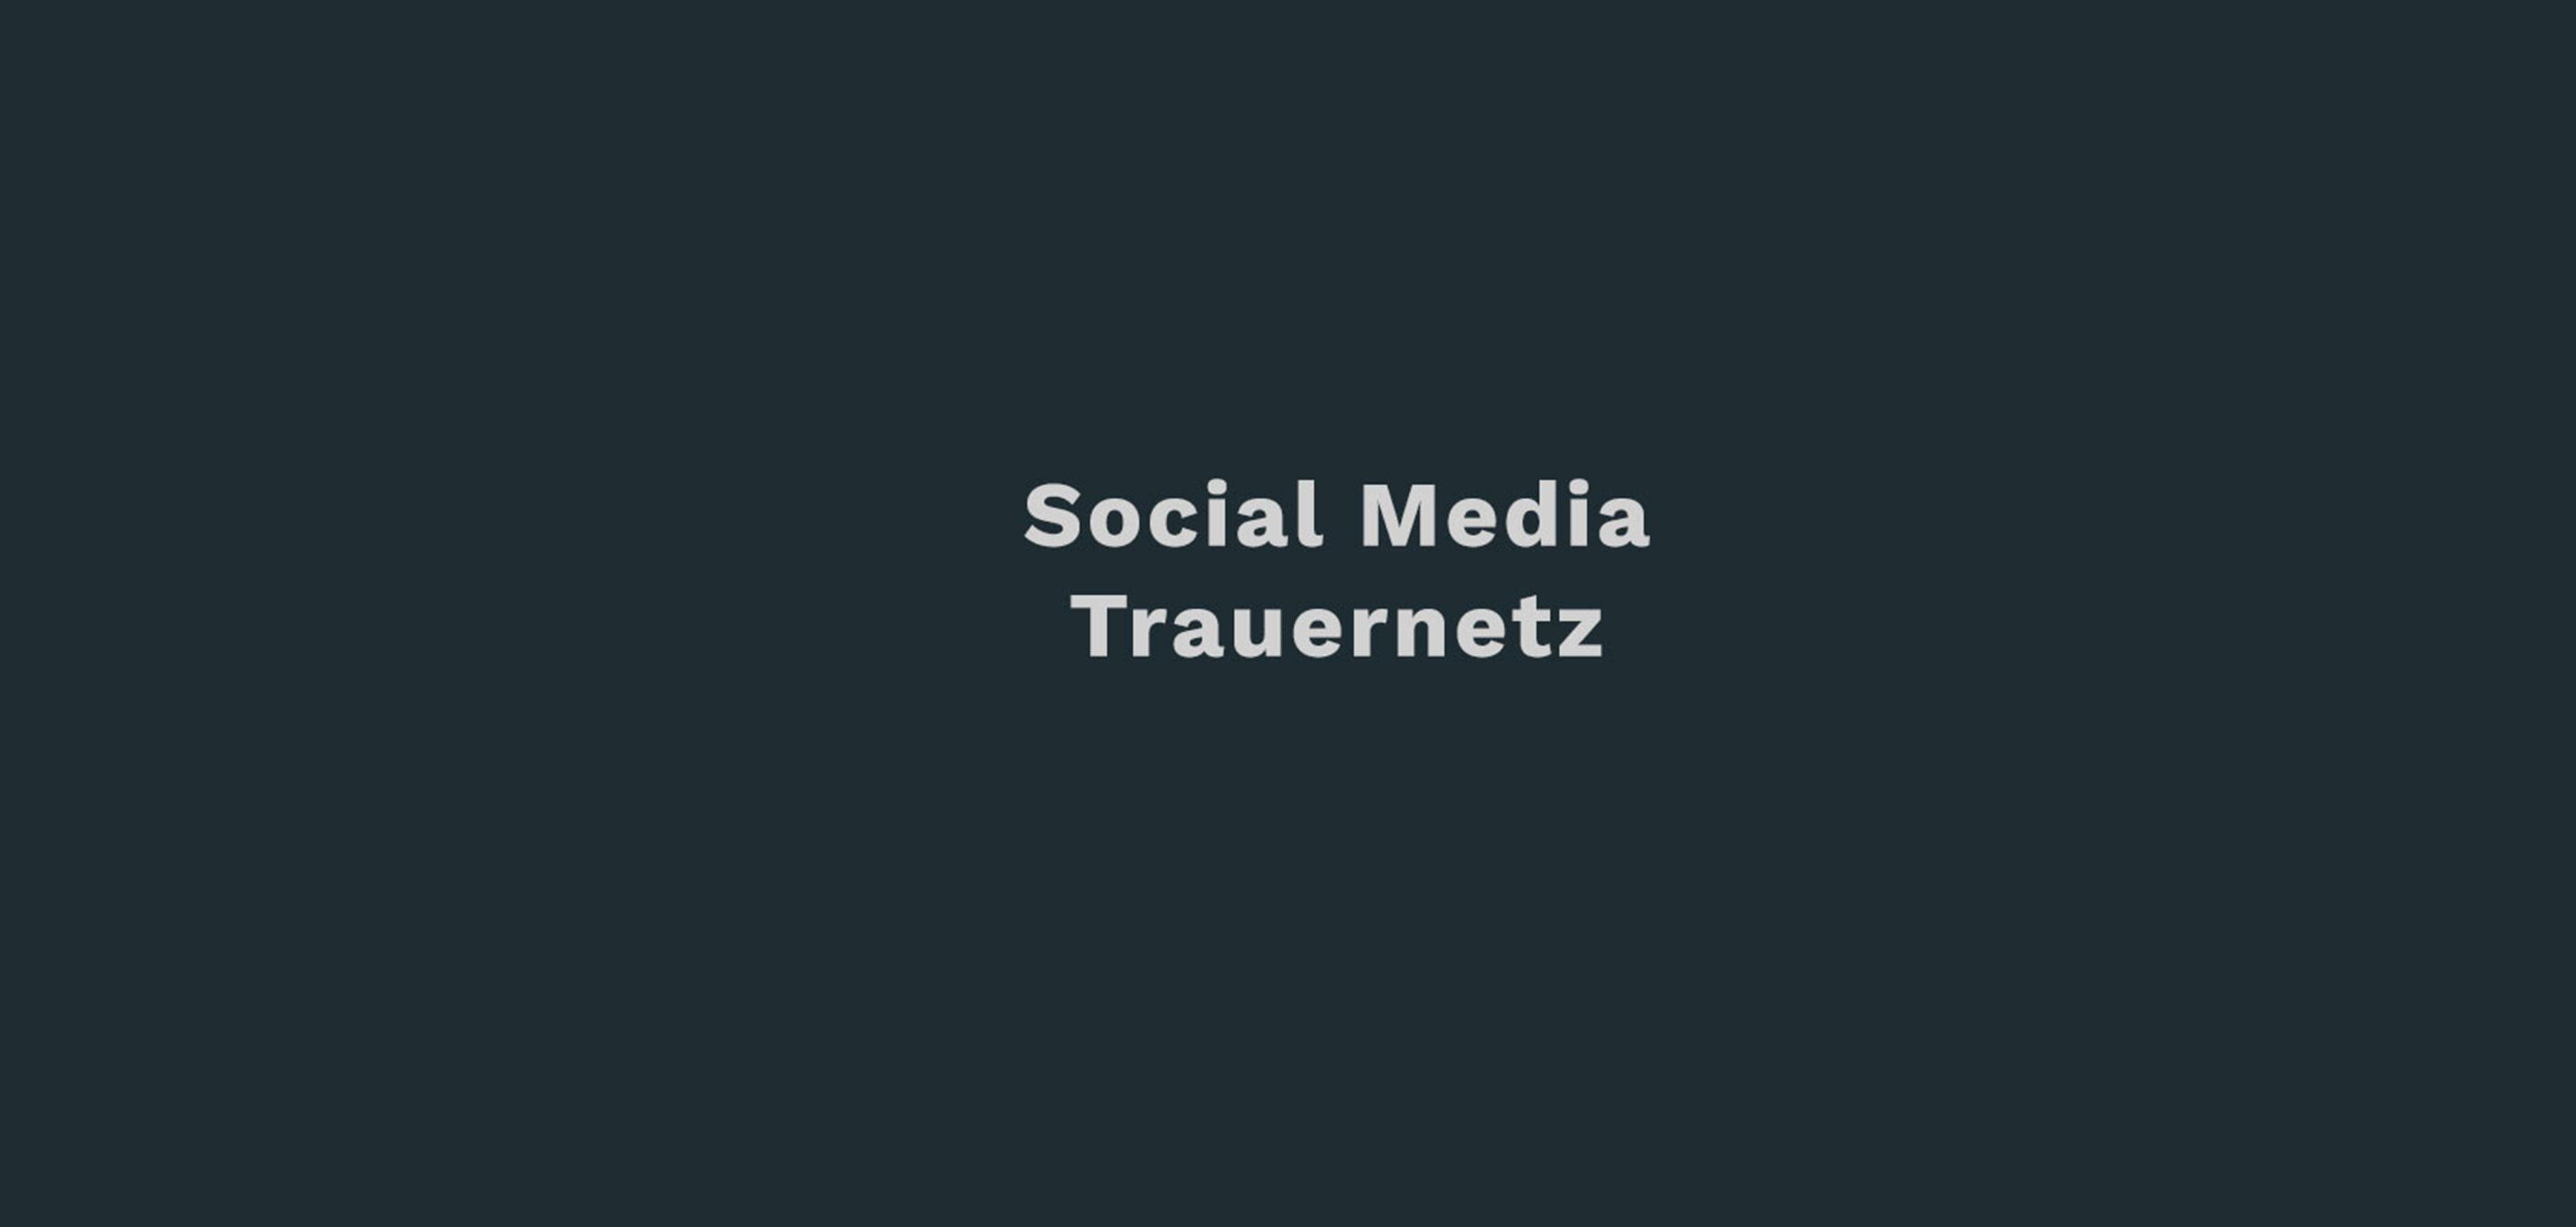 Trauernetz-DZP-Social-Media